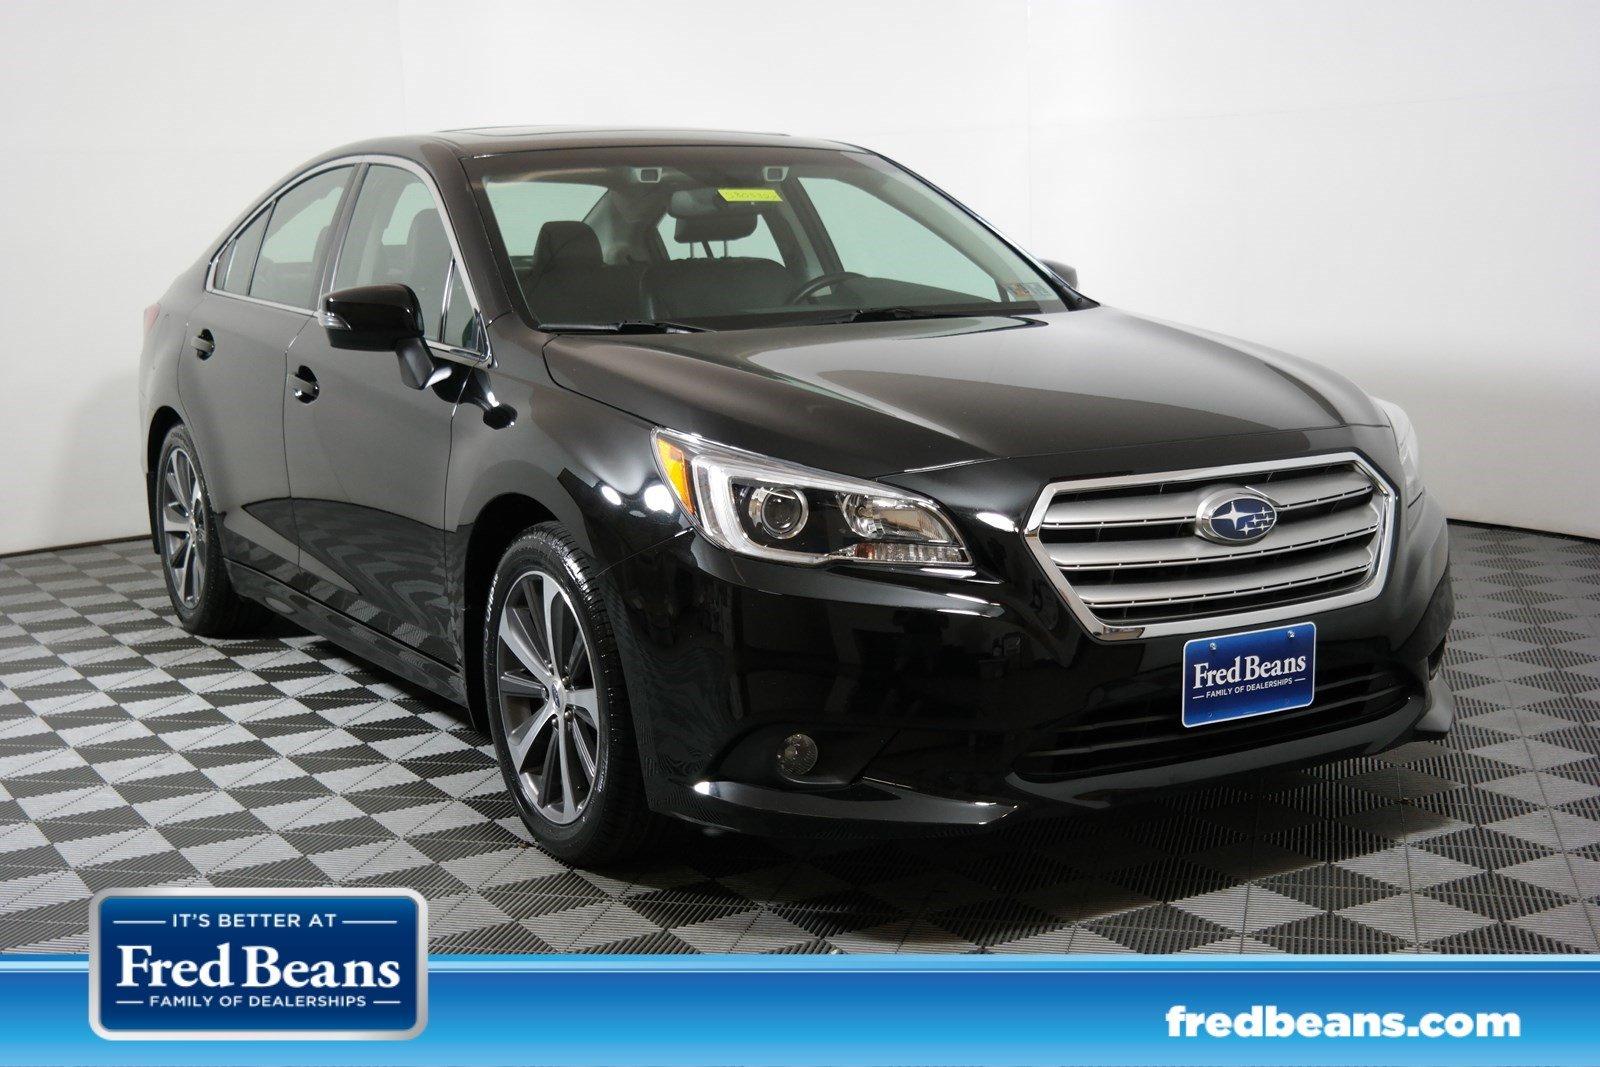 Photo Certified Used 2015 Subaru Legacy 2.5i Limited For Sale in Doylestown PA - Serving Allentown, Jenkintown  Sellersville  4S3BNAN65F3070629